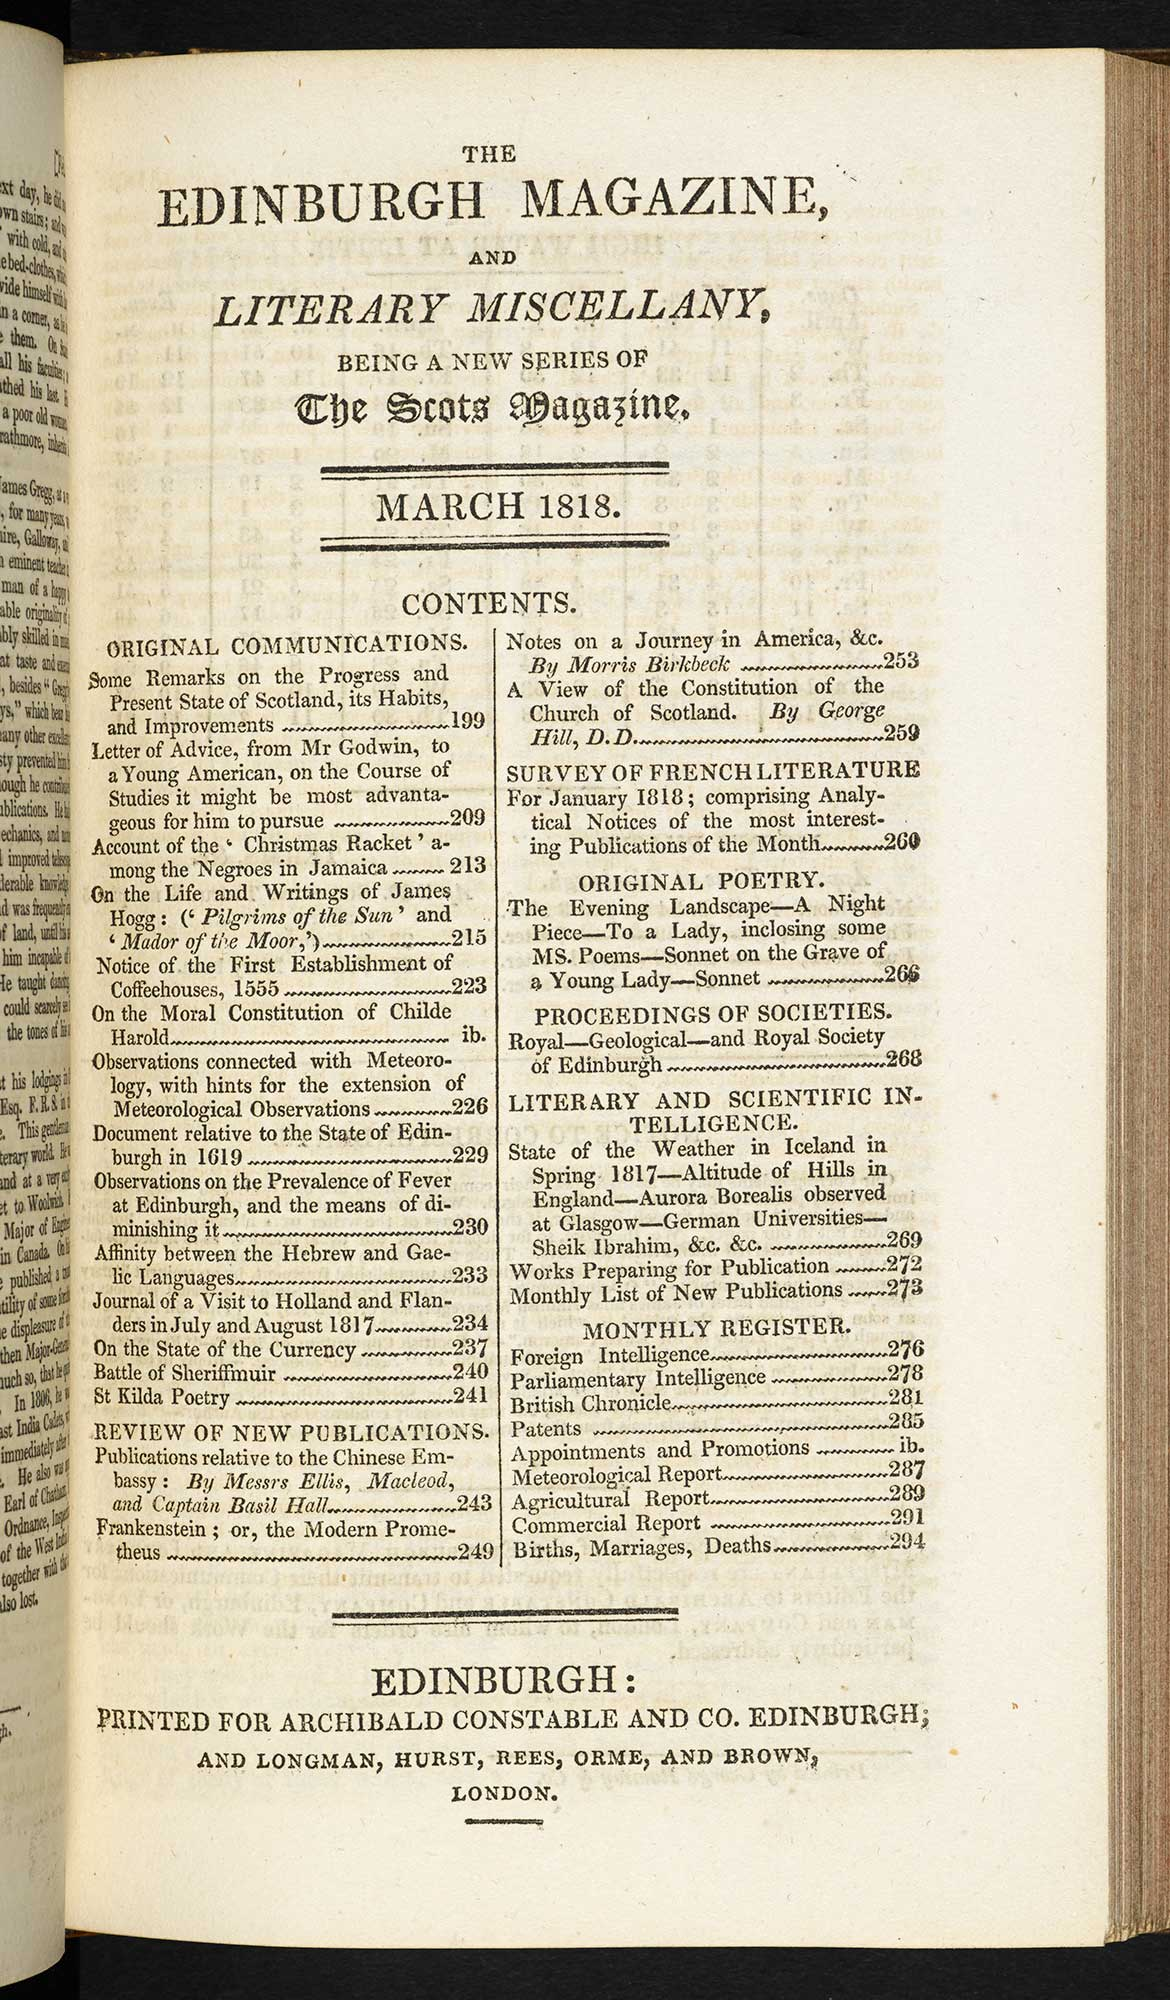 Walter Scott's review of Frankenstein from the Edinburgh Magazine [page: vol. 81 p. 197]